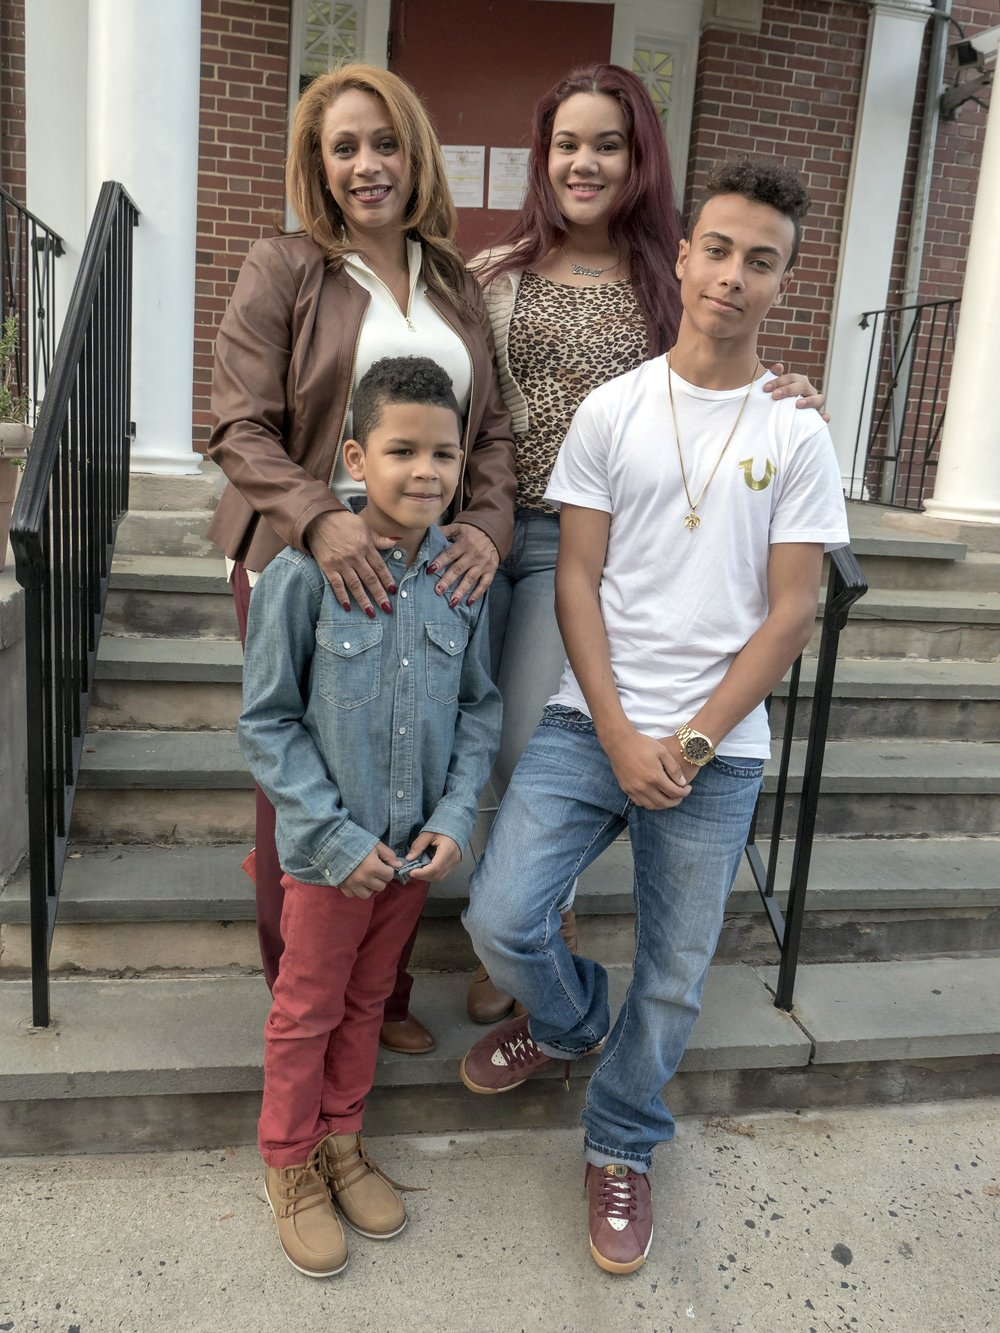 Children's Day Preschool and Family Center in Passaic NJ (1).jpg